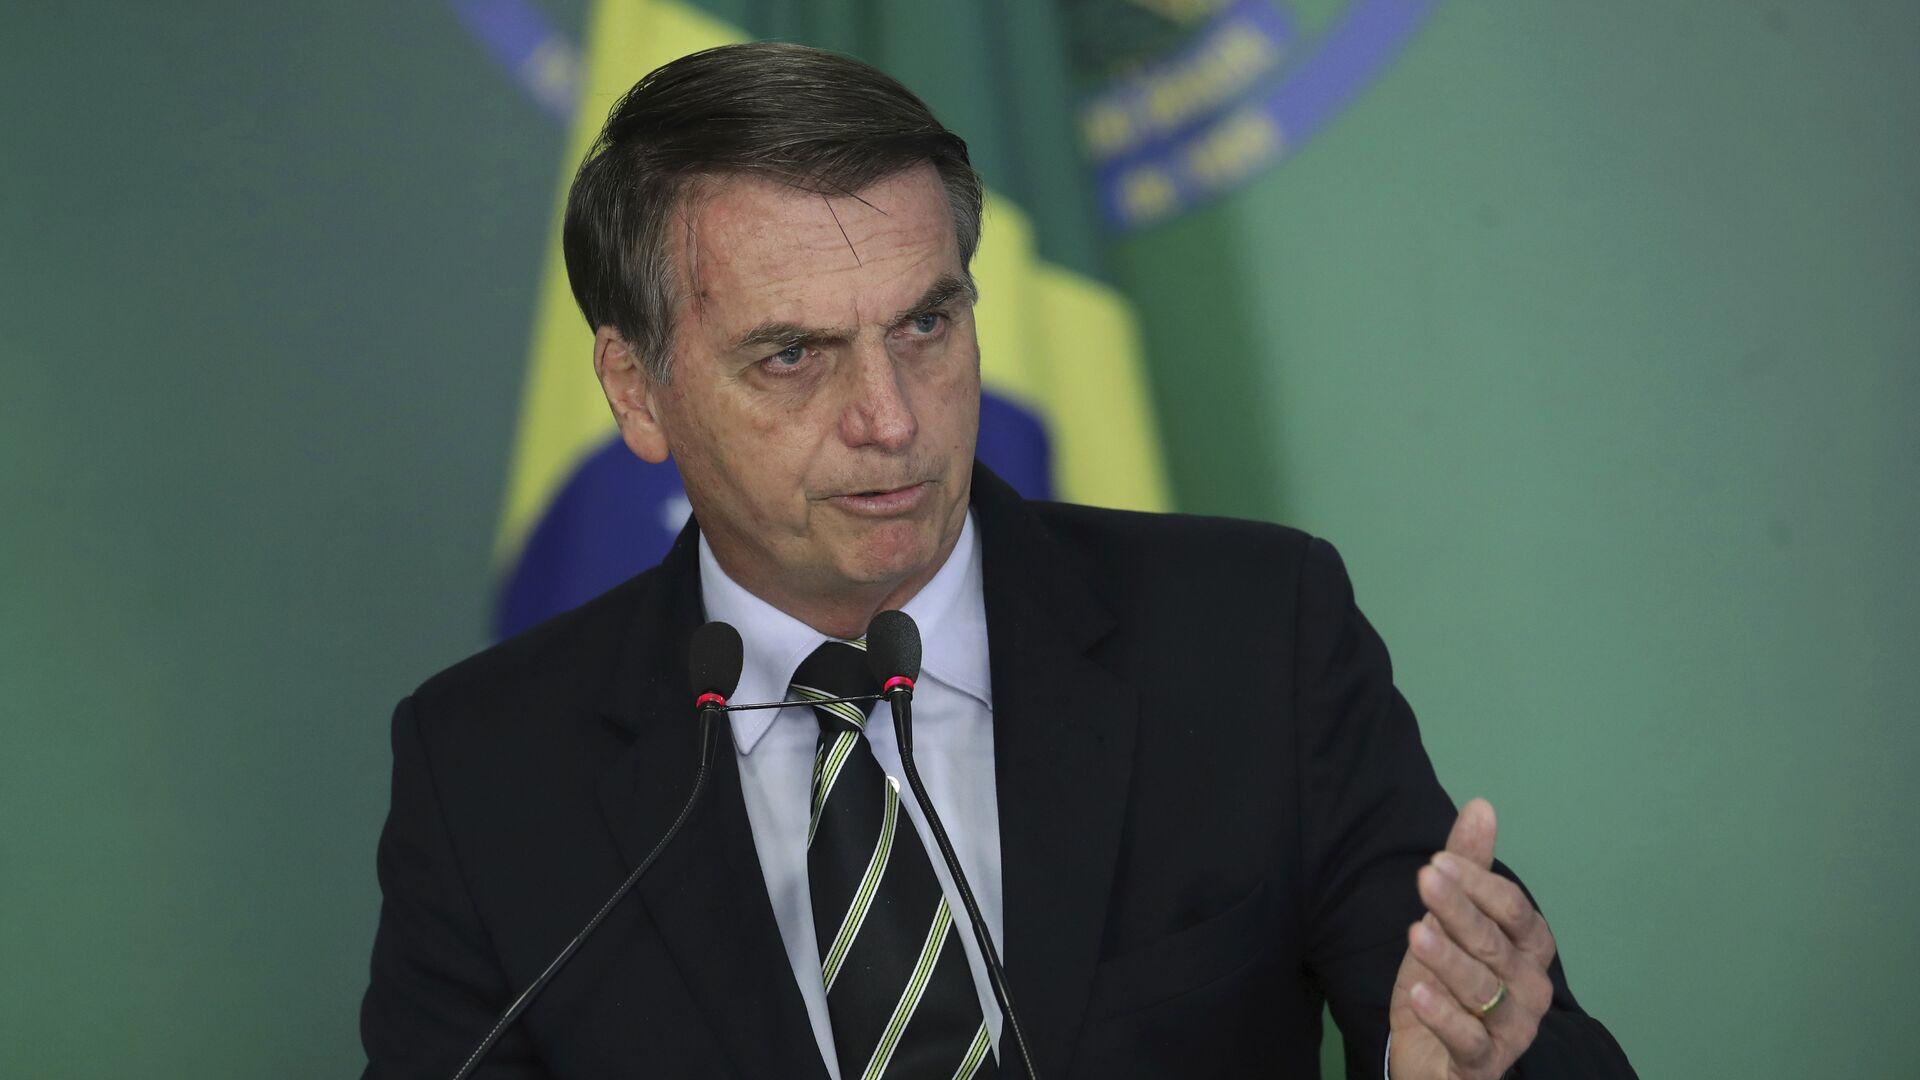 Jair Bolsonaro, presidente de Brasil - Sputnik Mundo, 1920, 25.02.2021